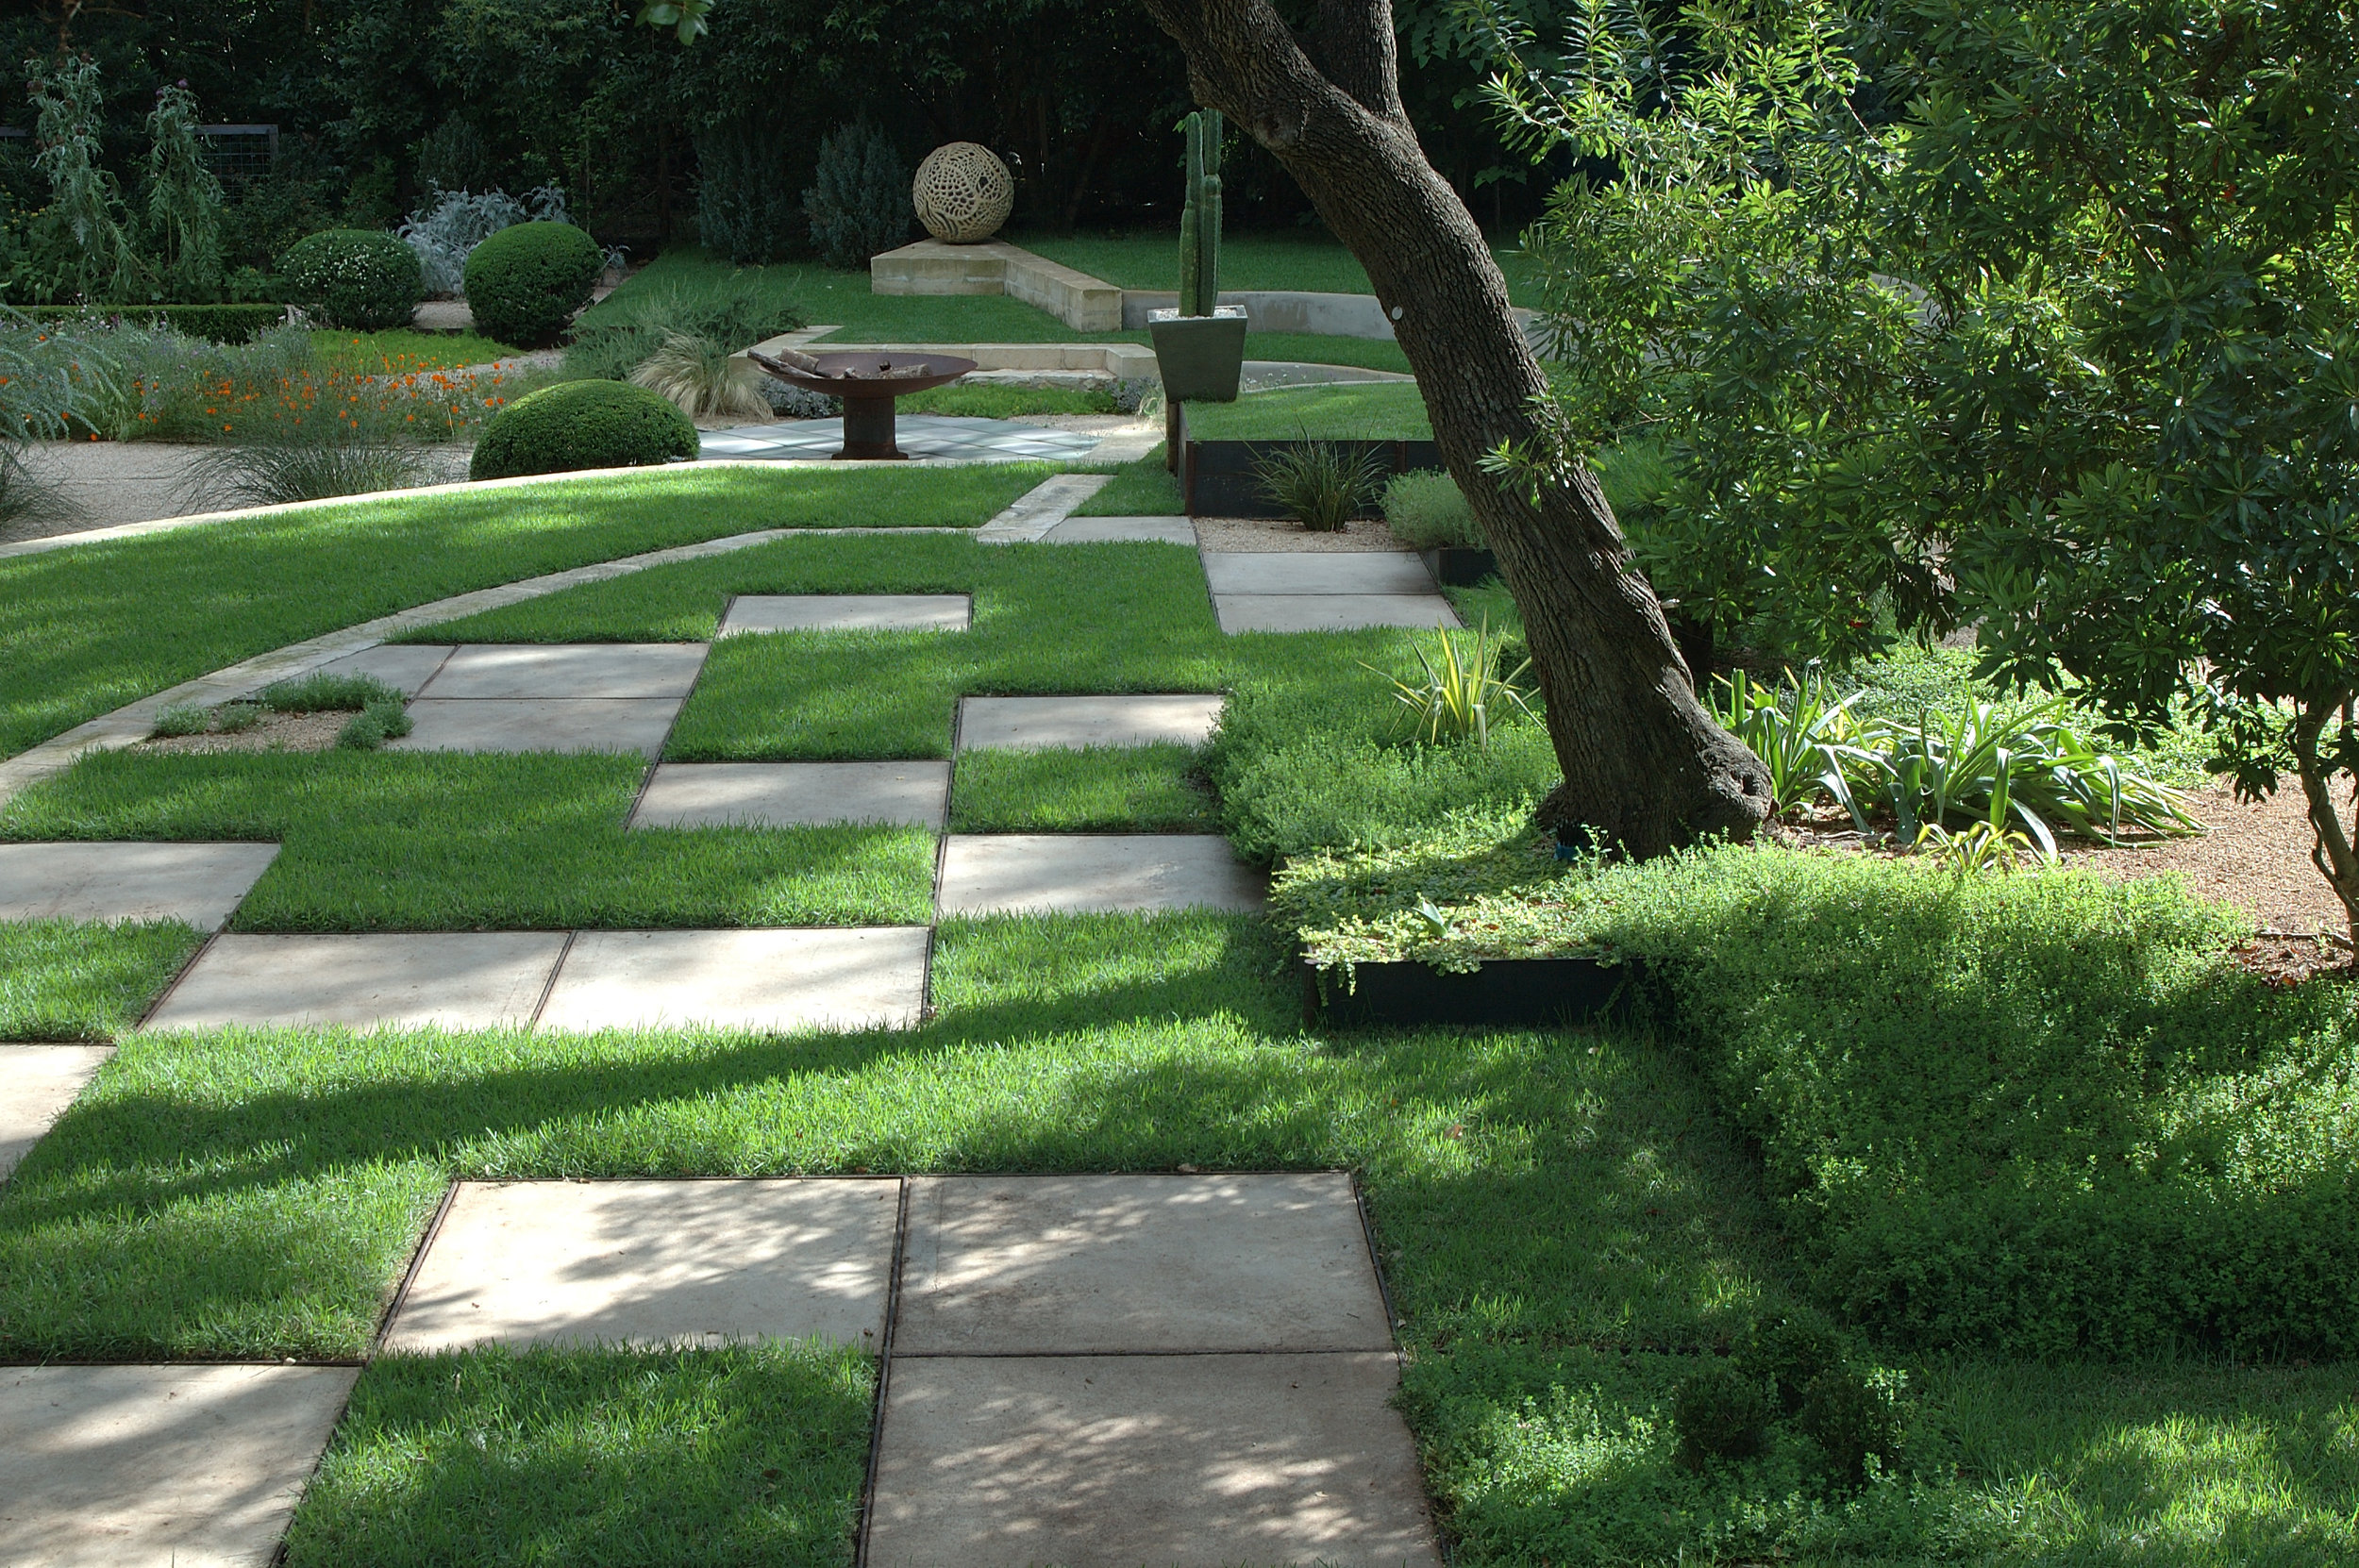 project-mayor-will-wynn-grass-checks.jpg